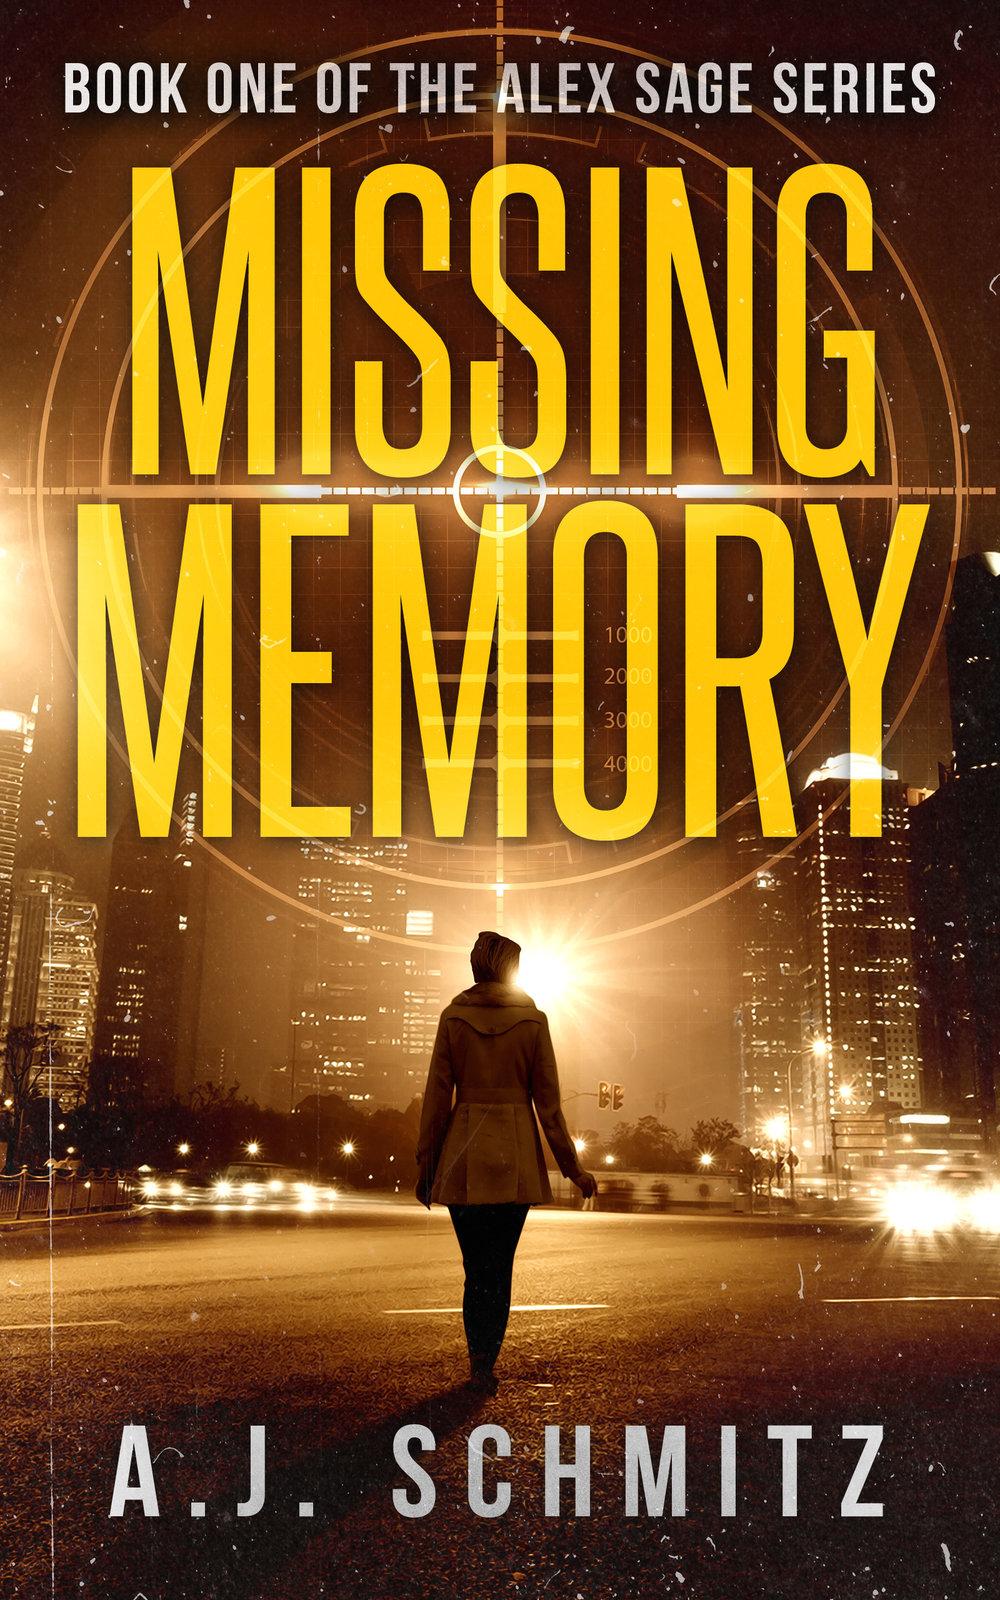 Missing Memory (Alex Sage Book 1) - Ingram Spark.jpg